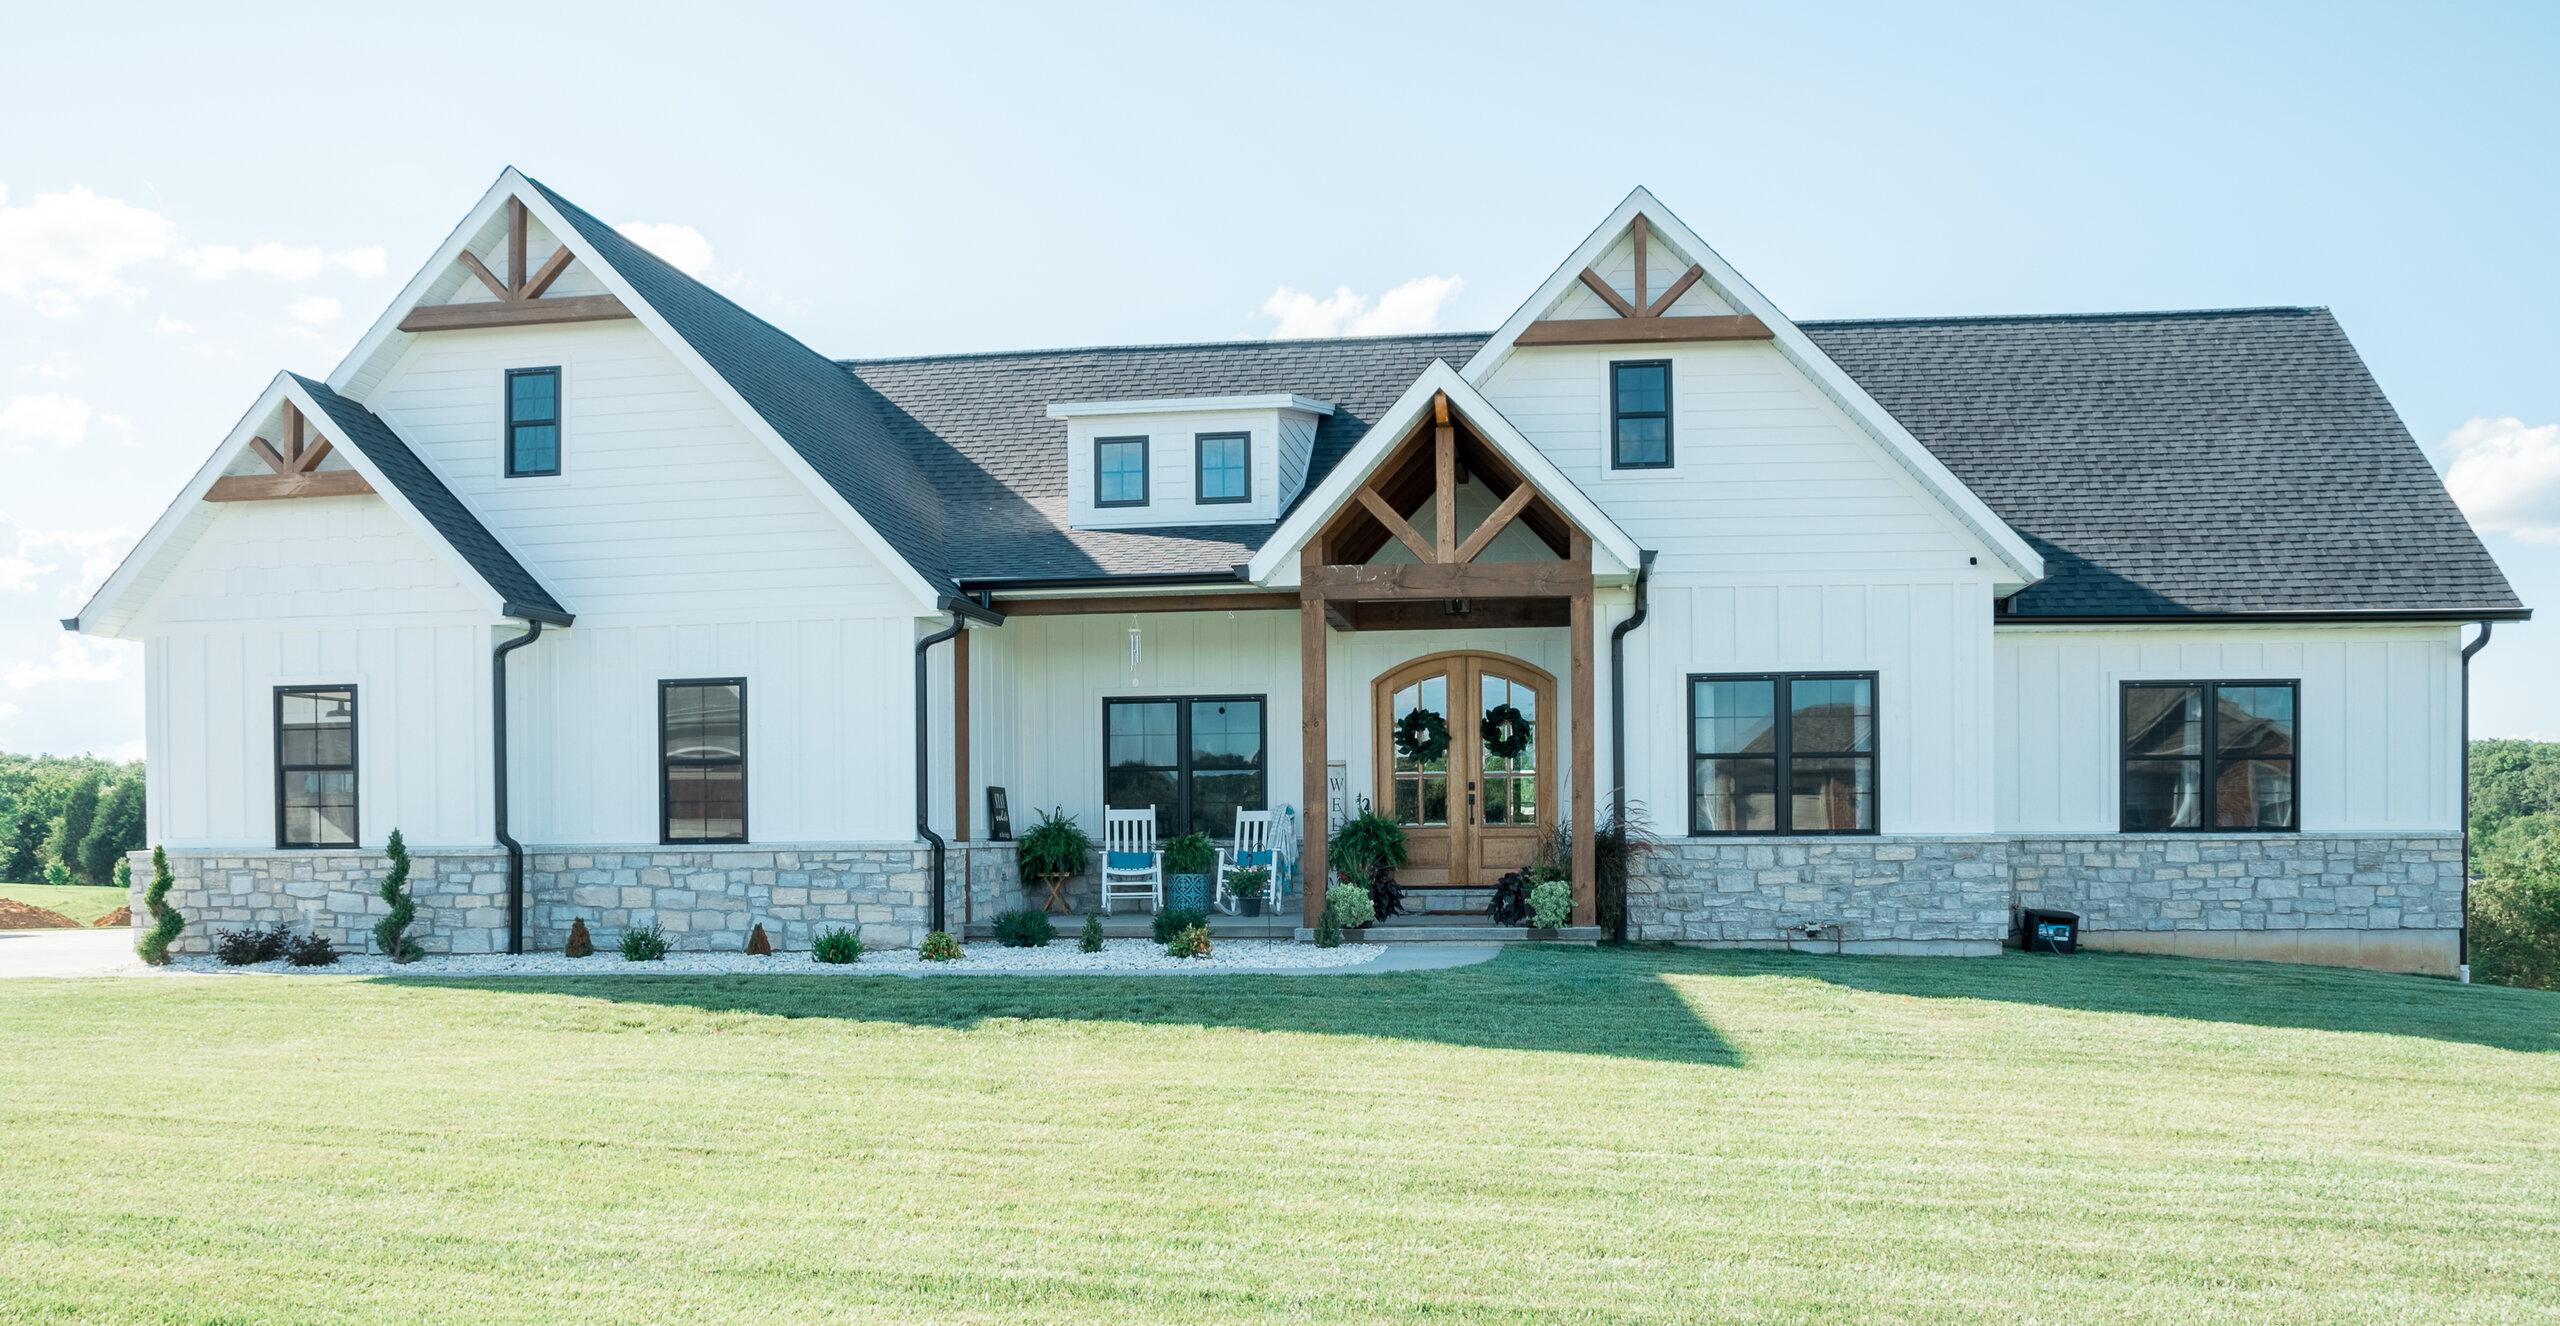 farm house on open land